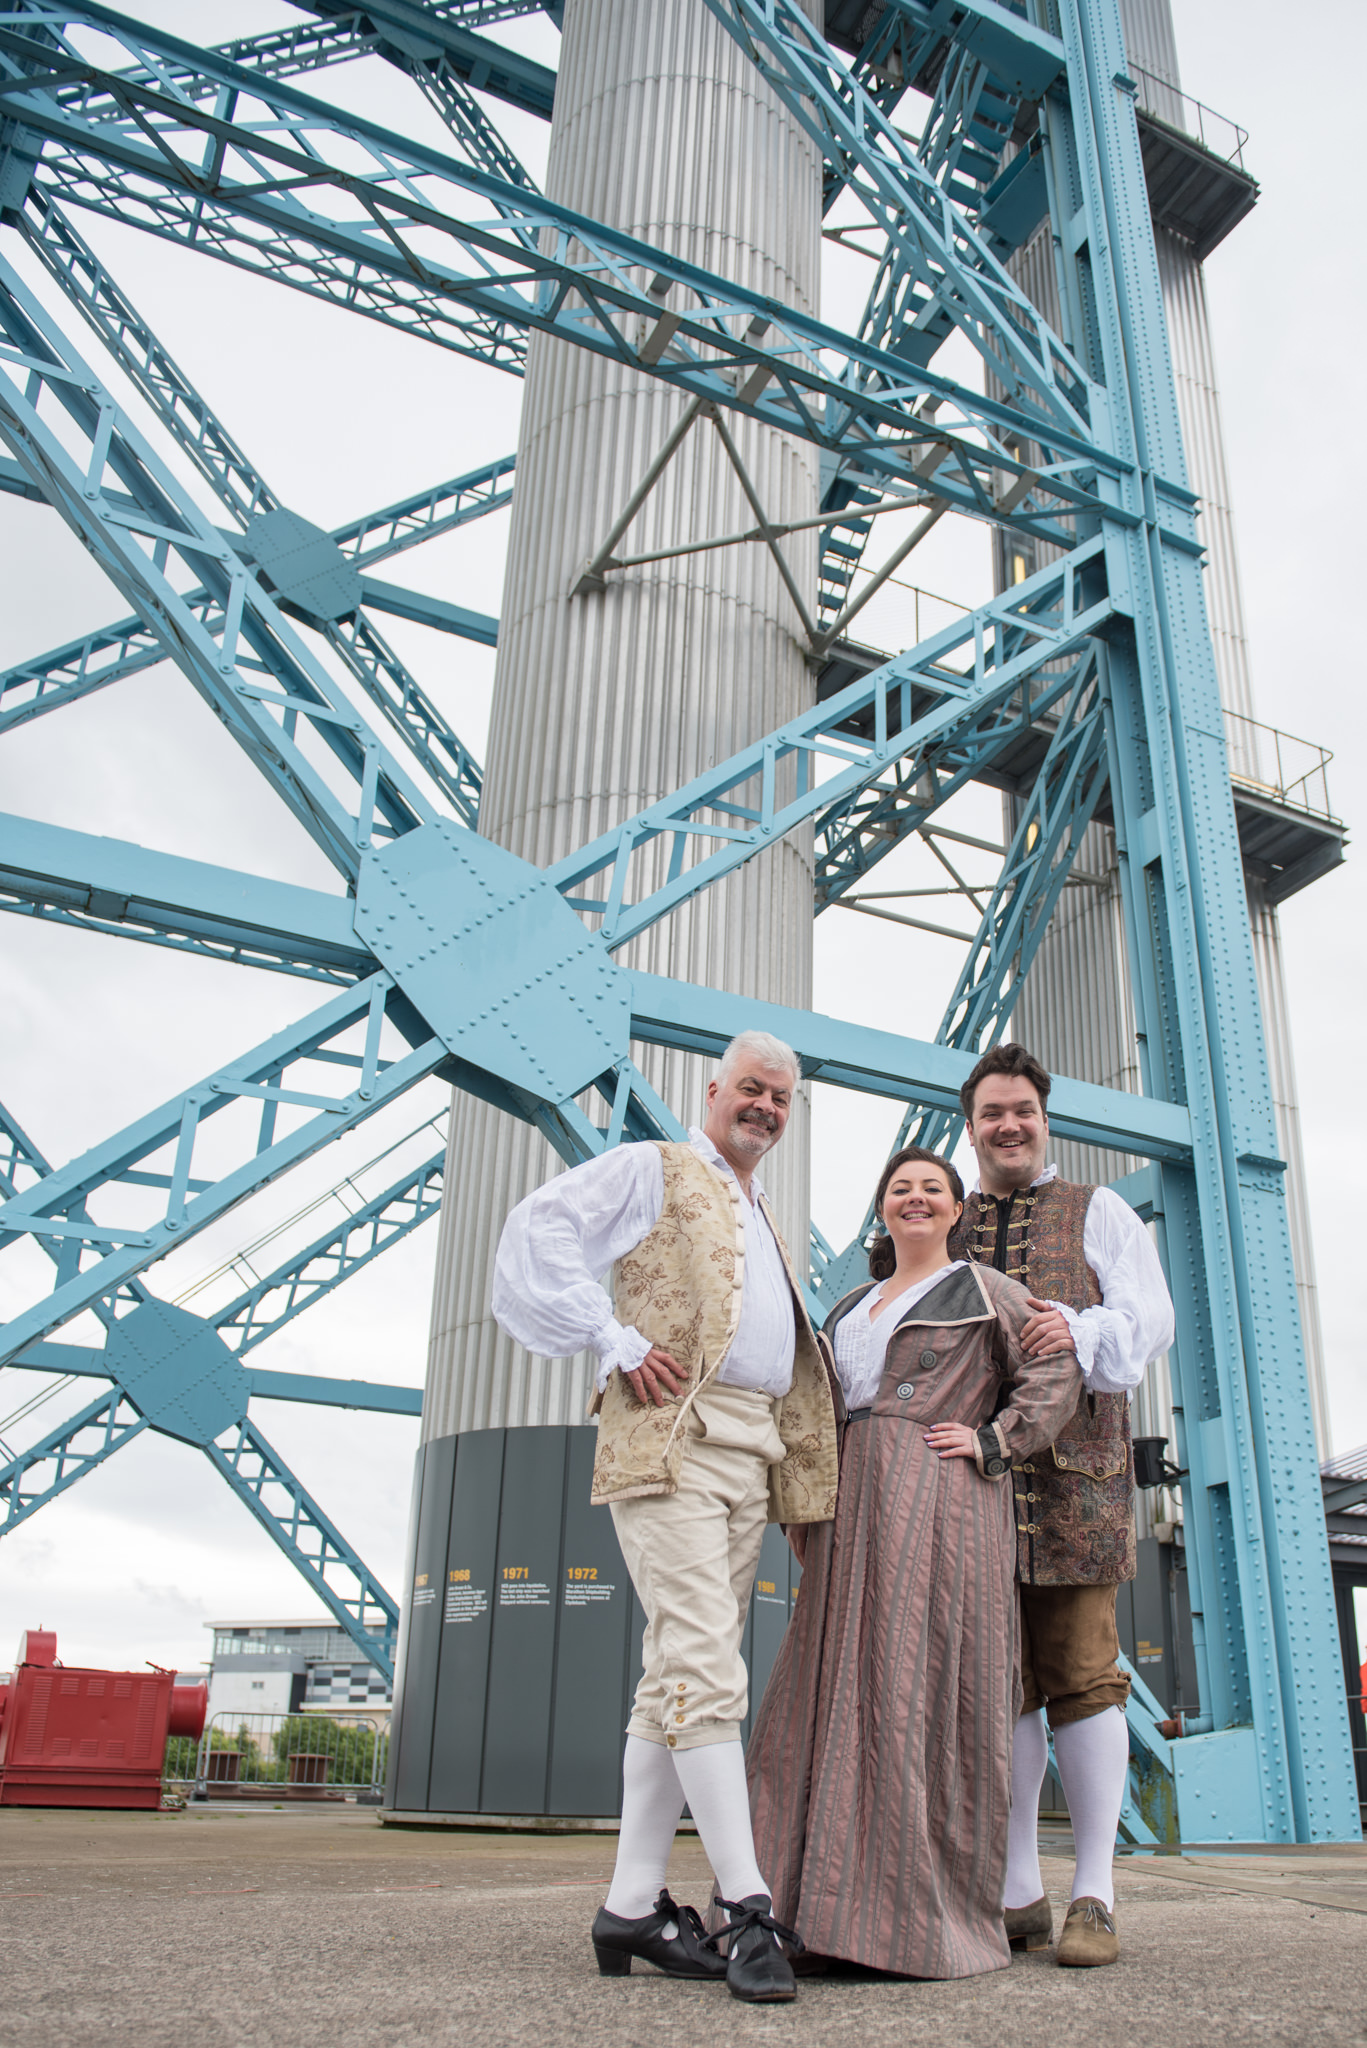 Scottish Opera - Pop-up at Titan Crane - Clydebank - 20 June 2016 © Julie Broadfoot/Photography by Juliebee